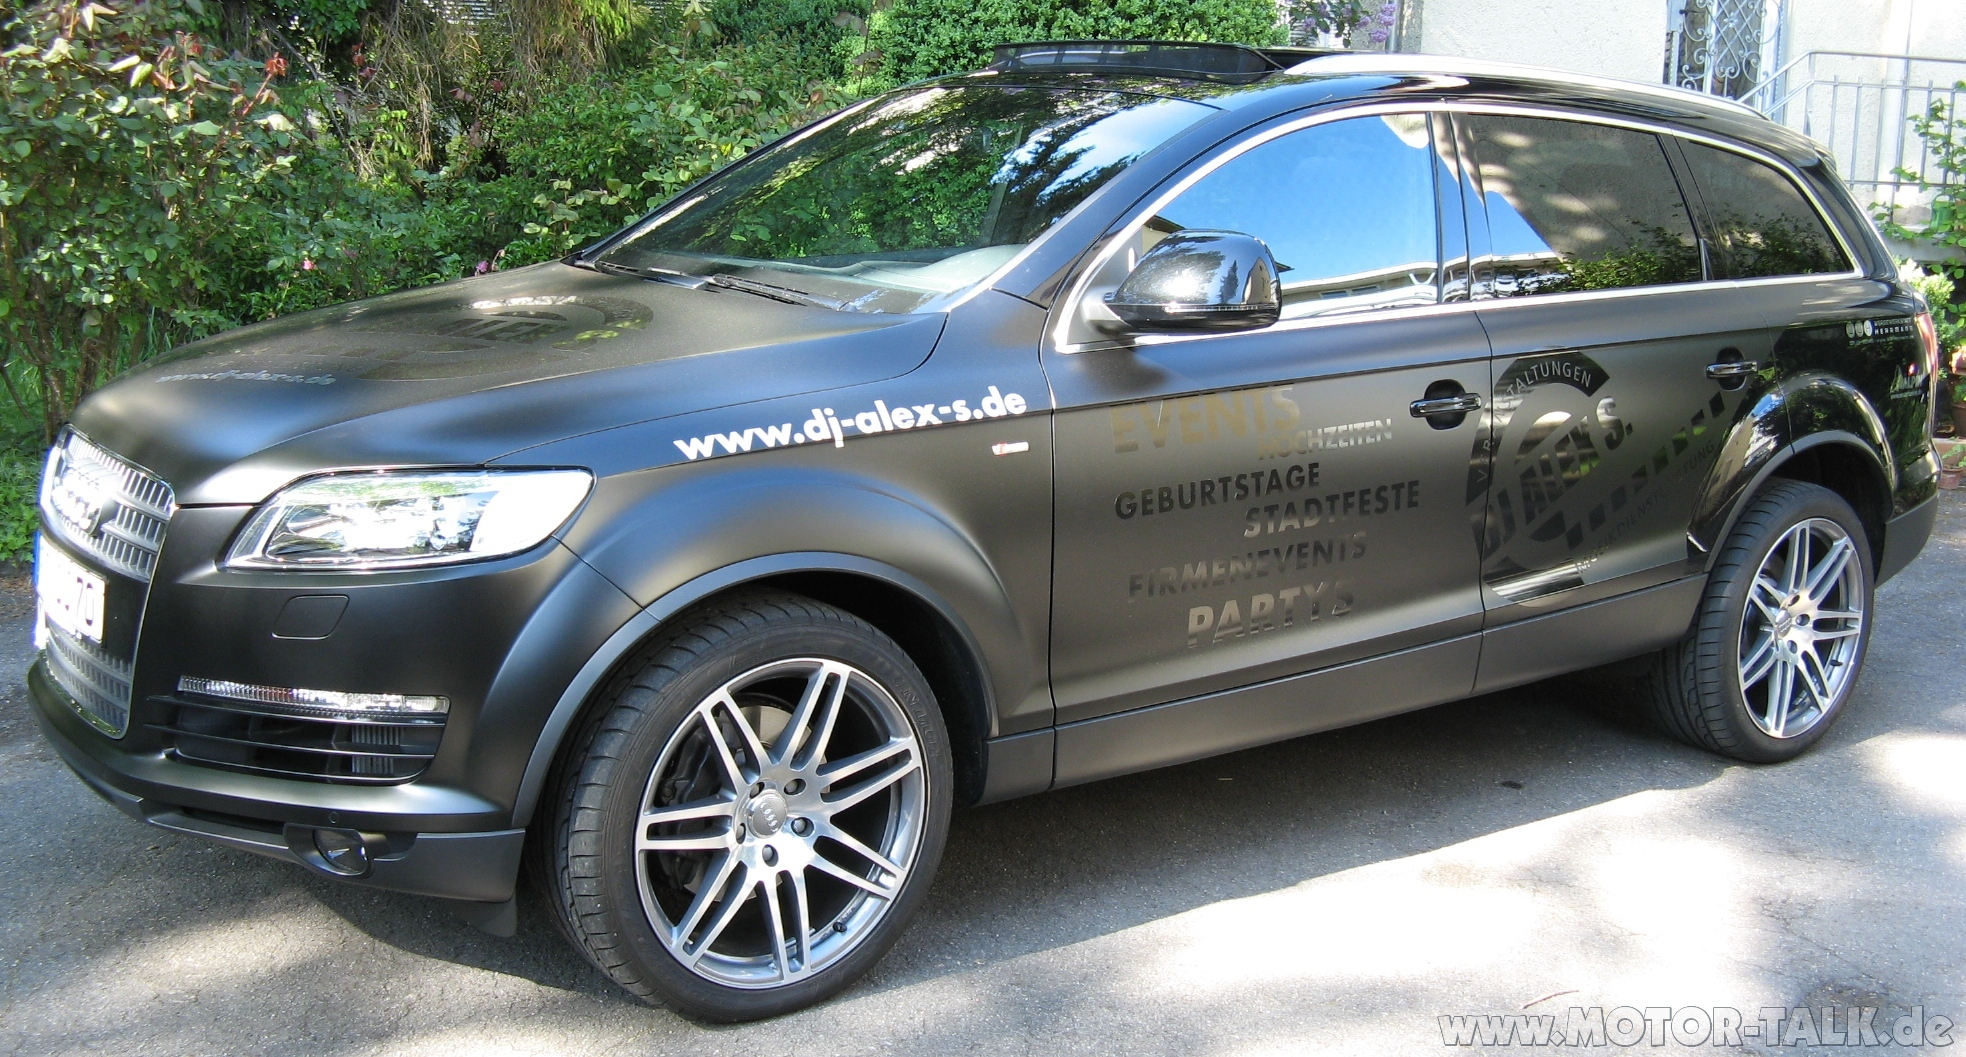 Img 1246 1 Matt Schwarz Audi Q7 203081367